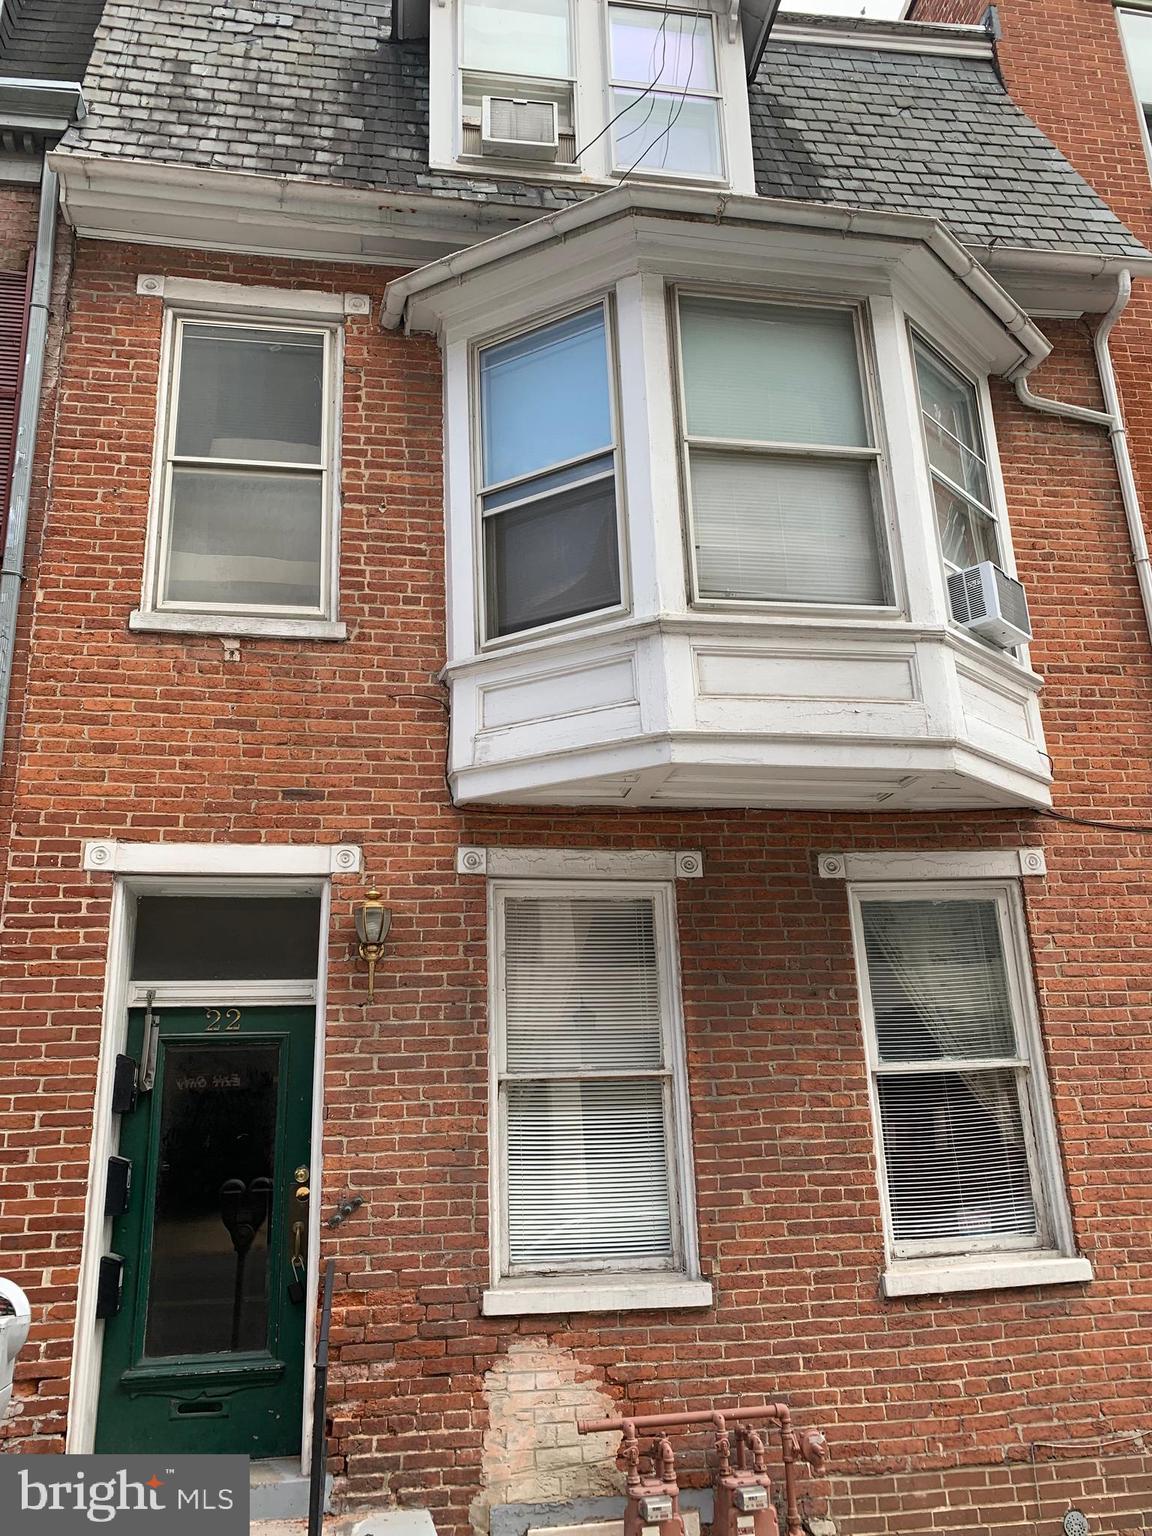 22 W KING STREET, YORK, PA 17401